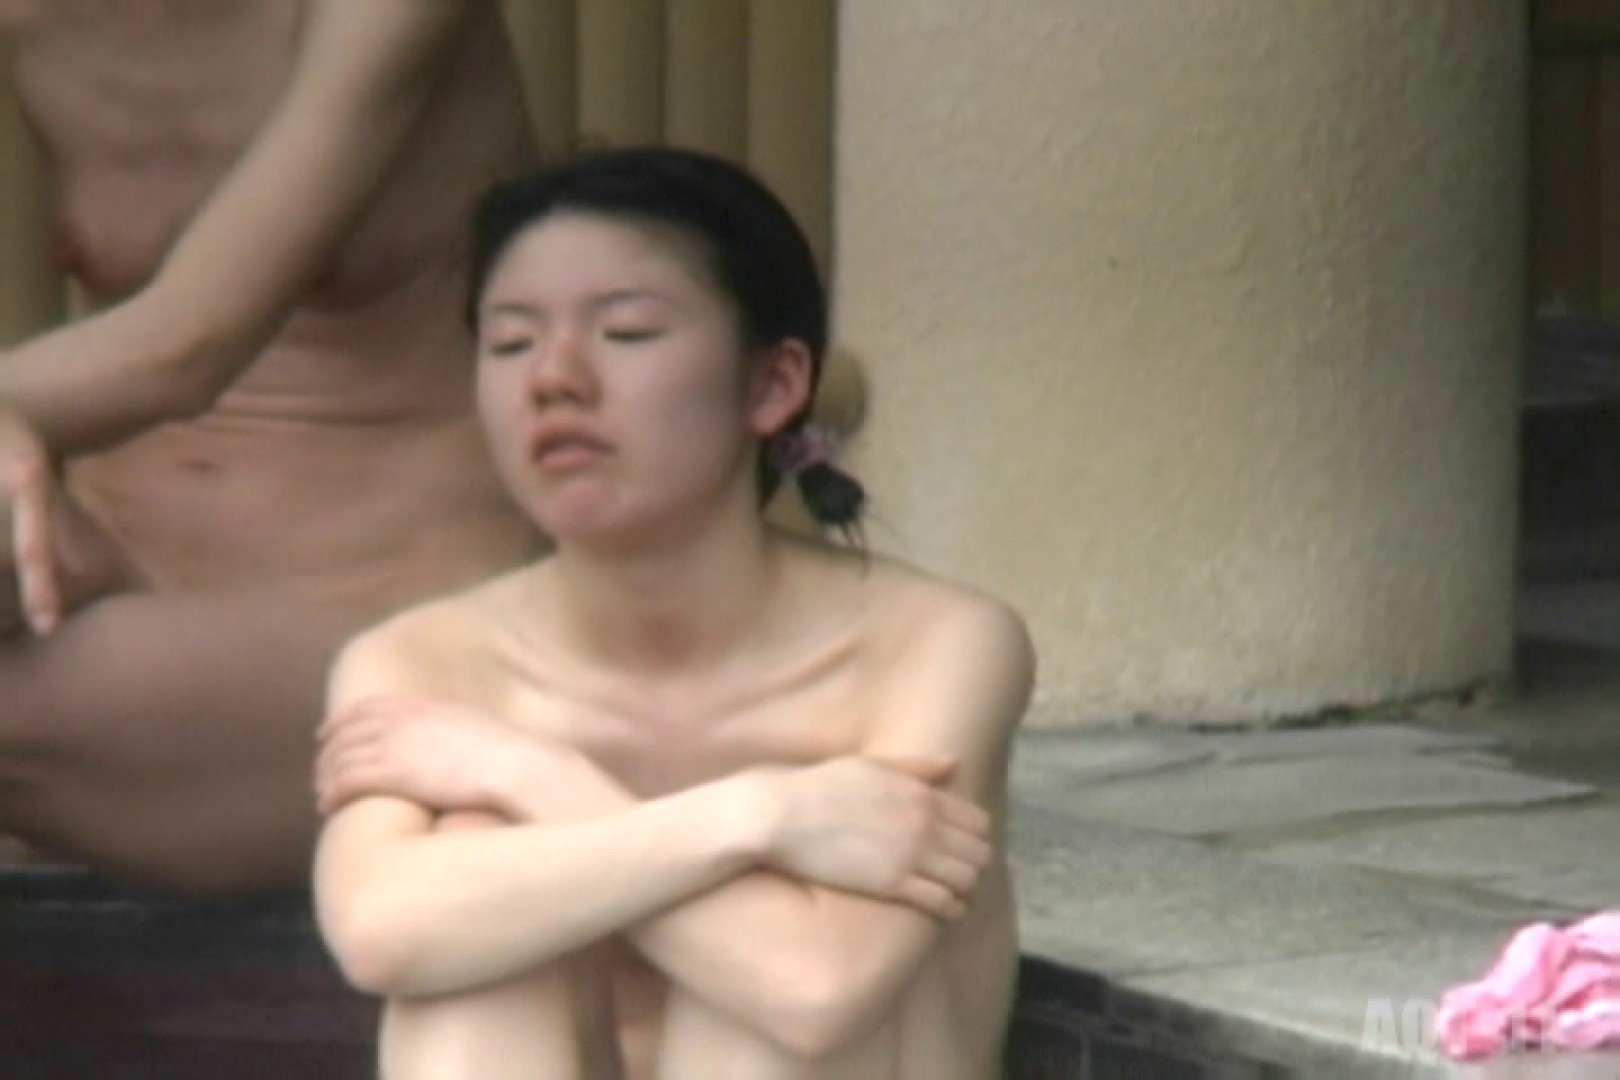 Aquaな露天風呂Vol.804 OL女体 アダルト動画キャプチャ 51連発 20